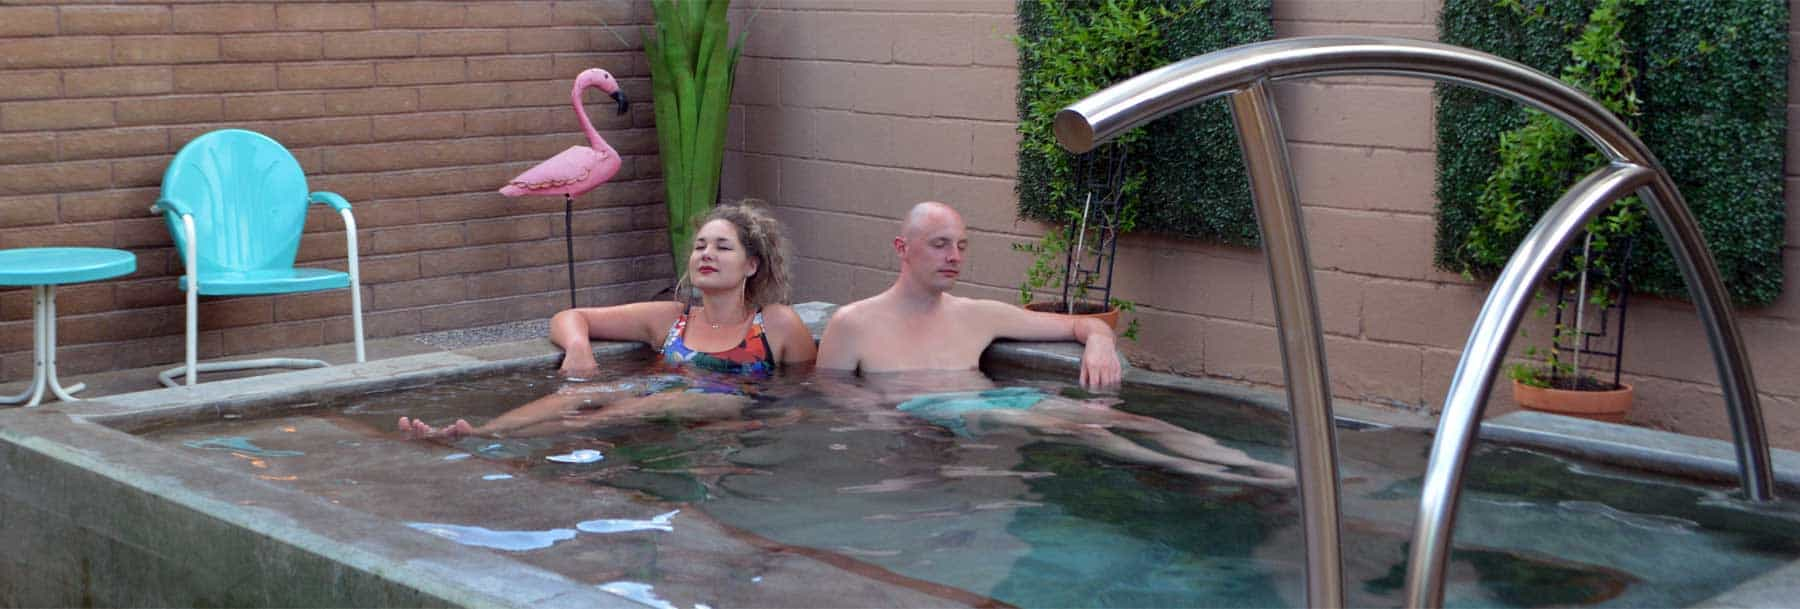 couple soaking at blackstone hotsprings in torc